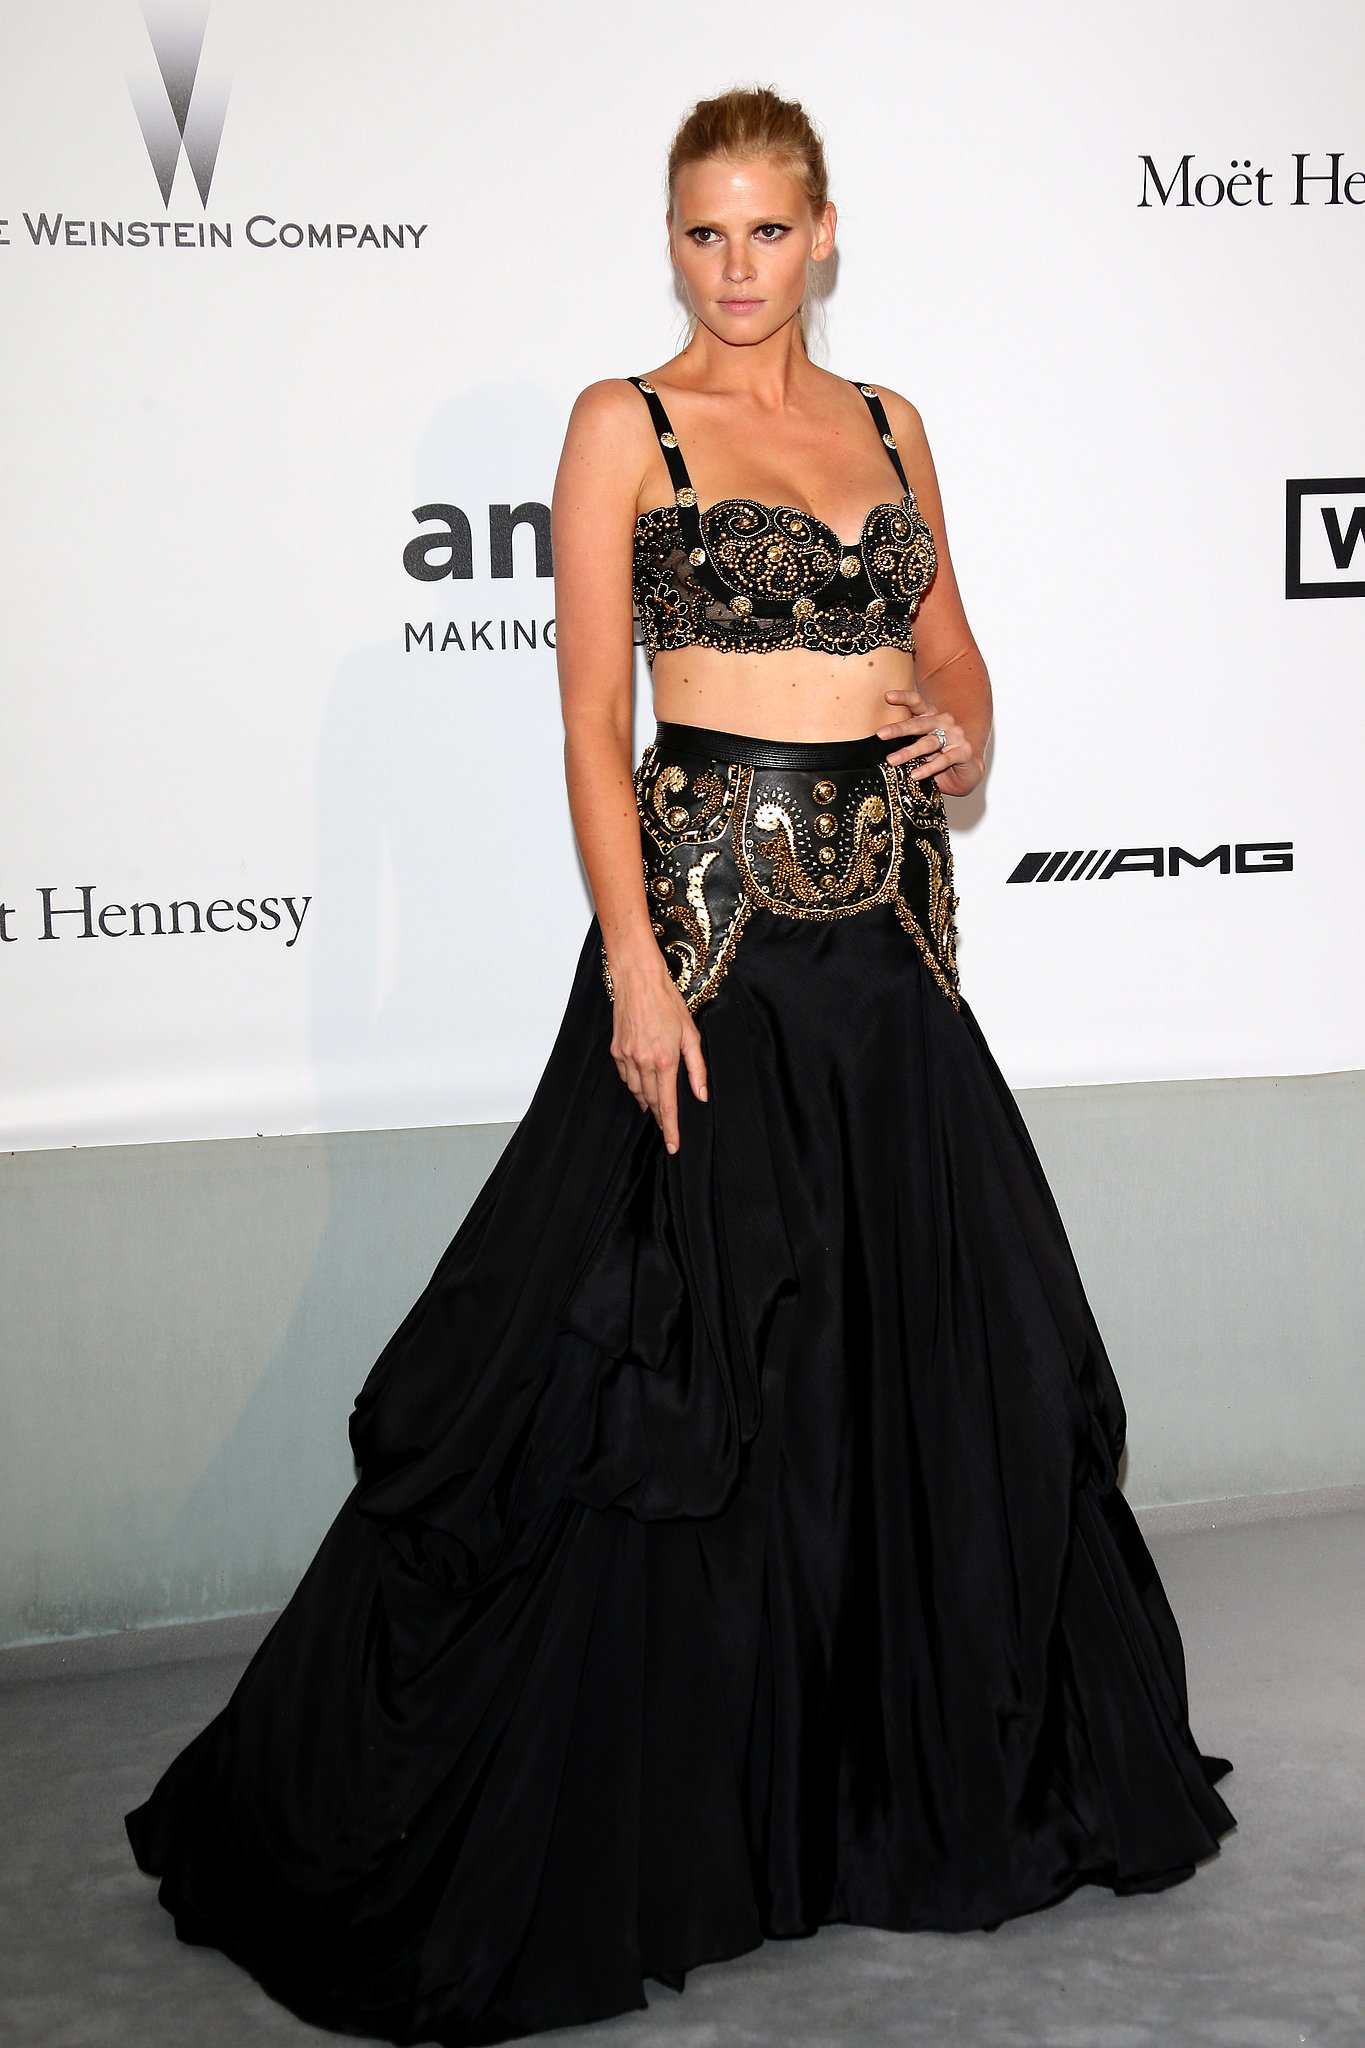 Model Lara Stone bared her midriff.